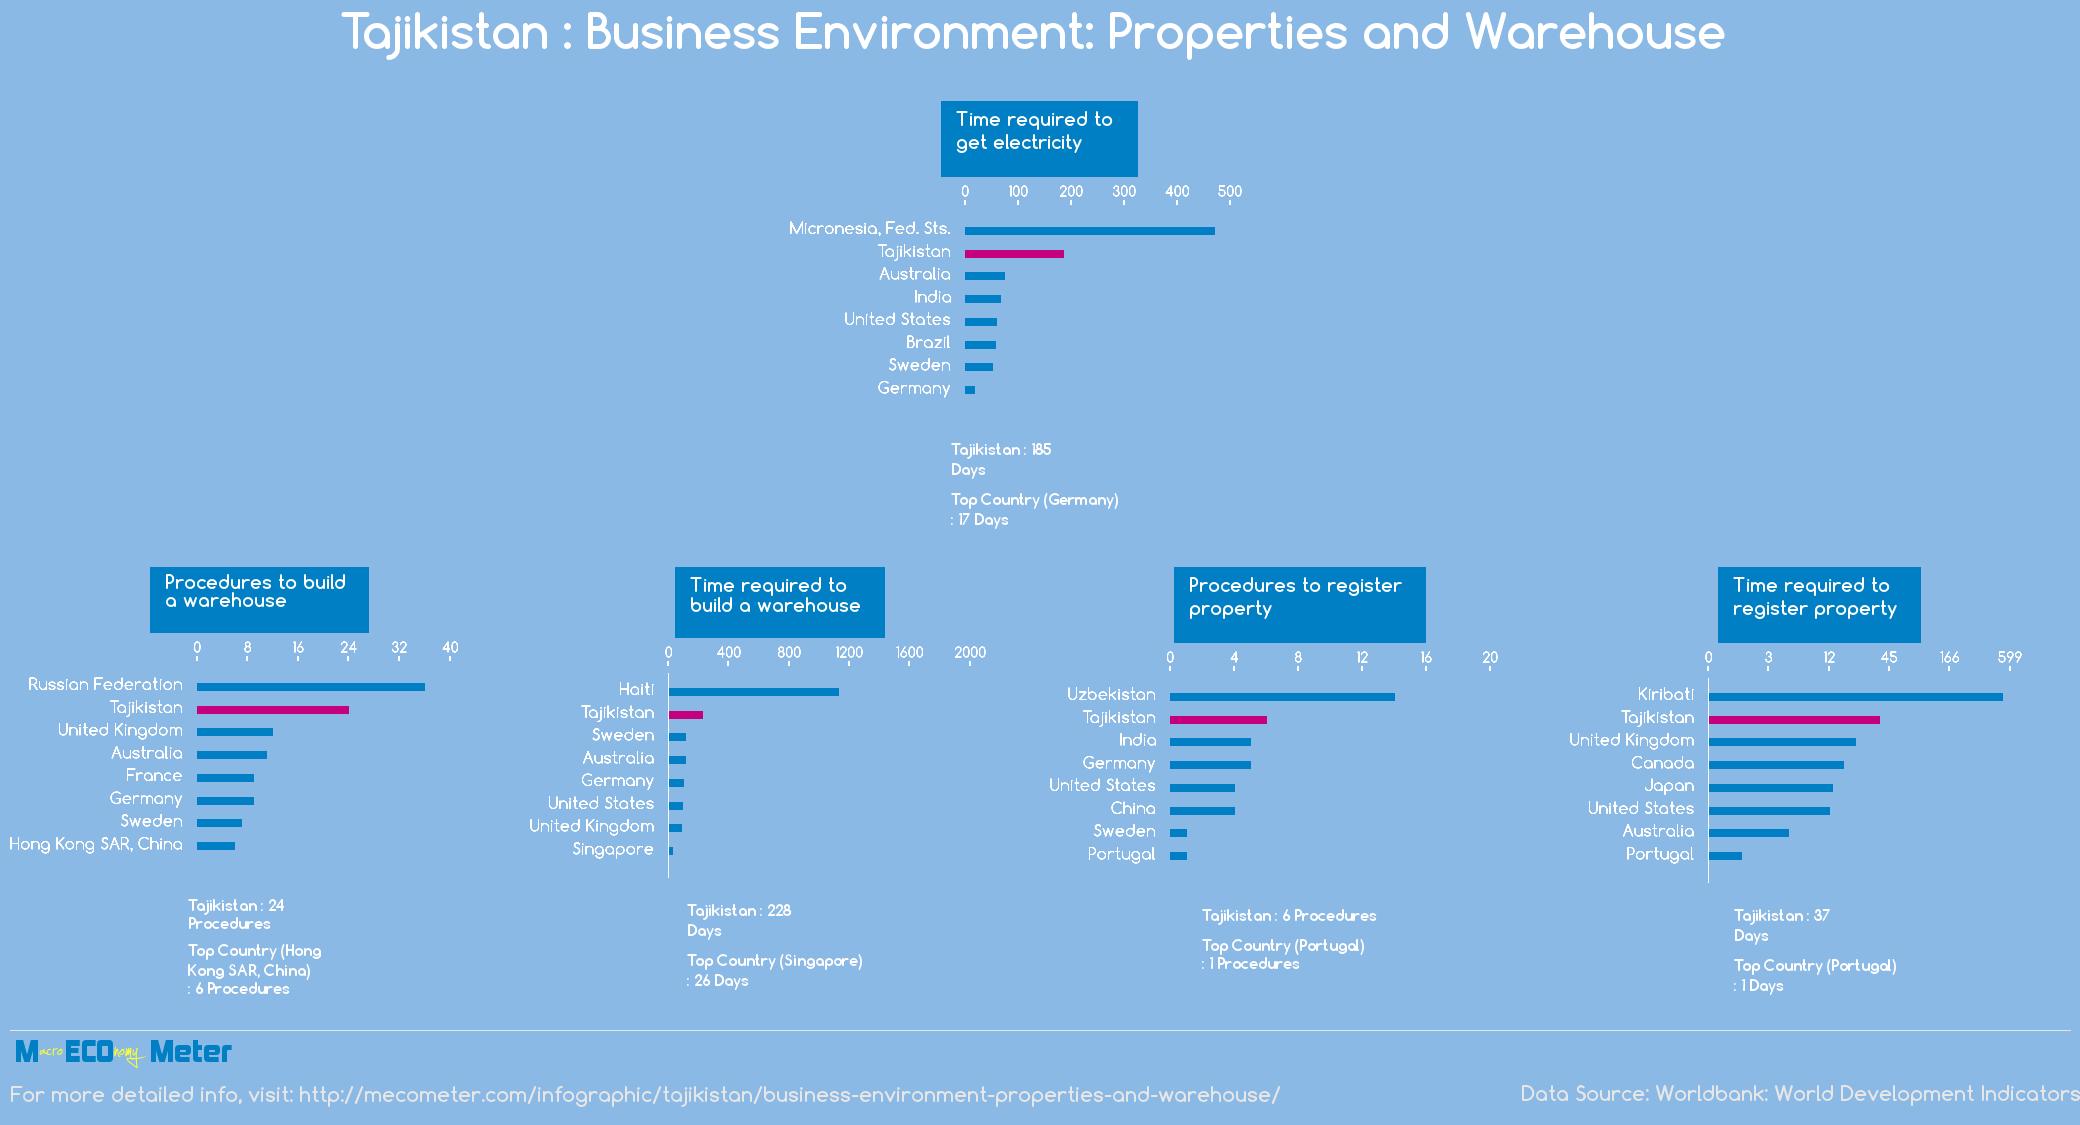 Tajikistan : Business Environment: Properties and Warehouse